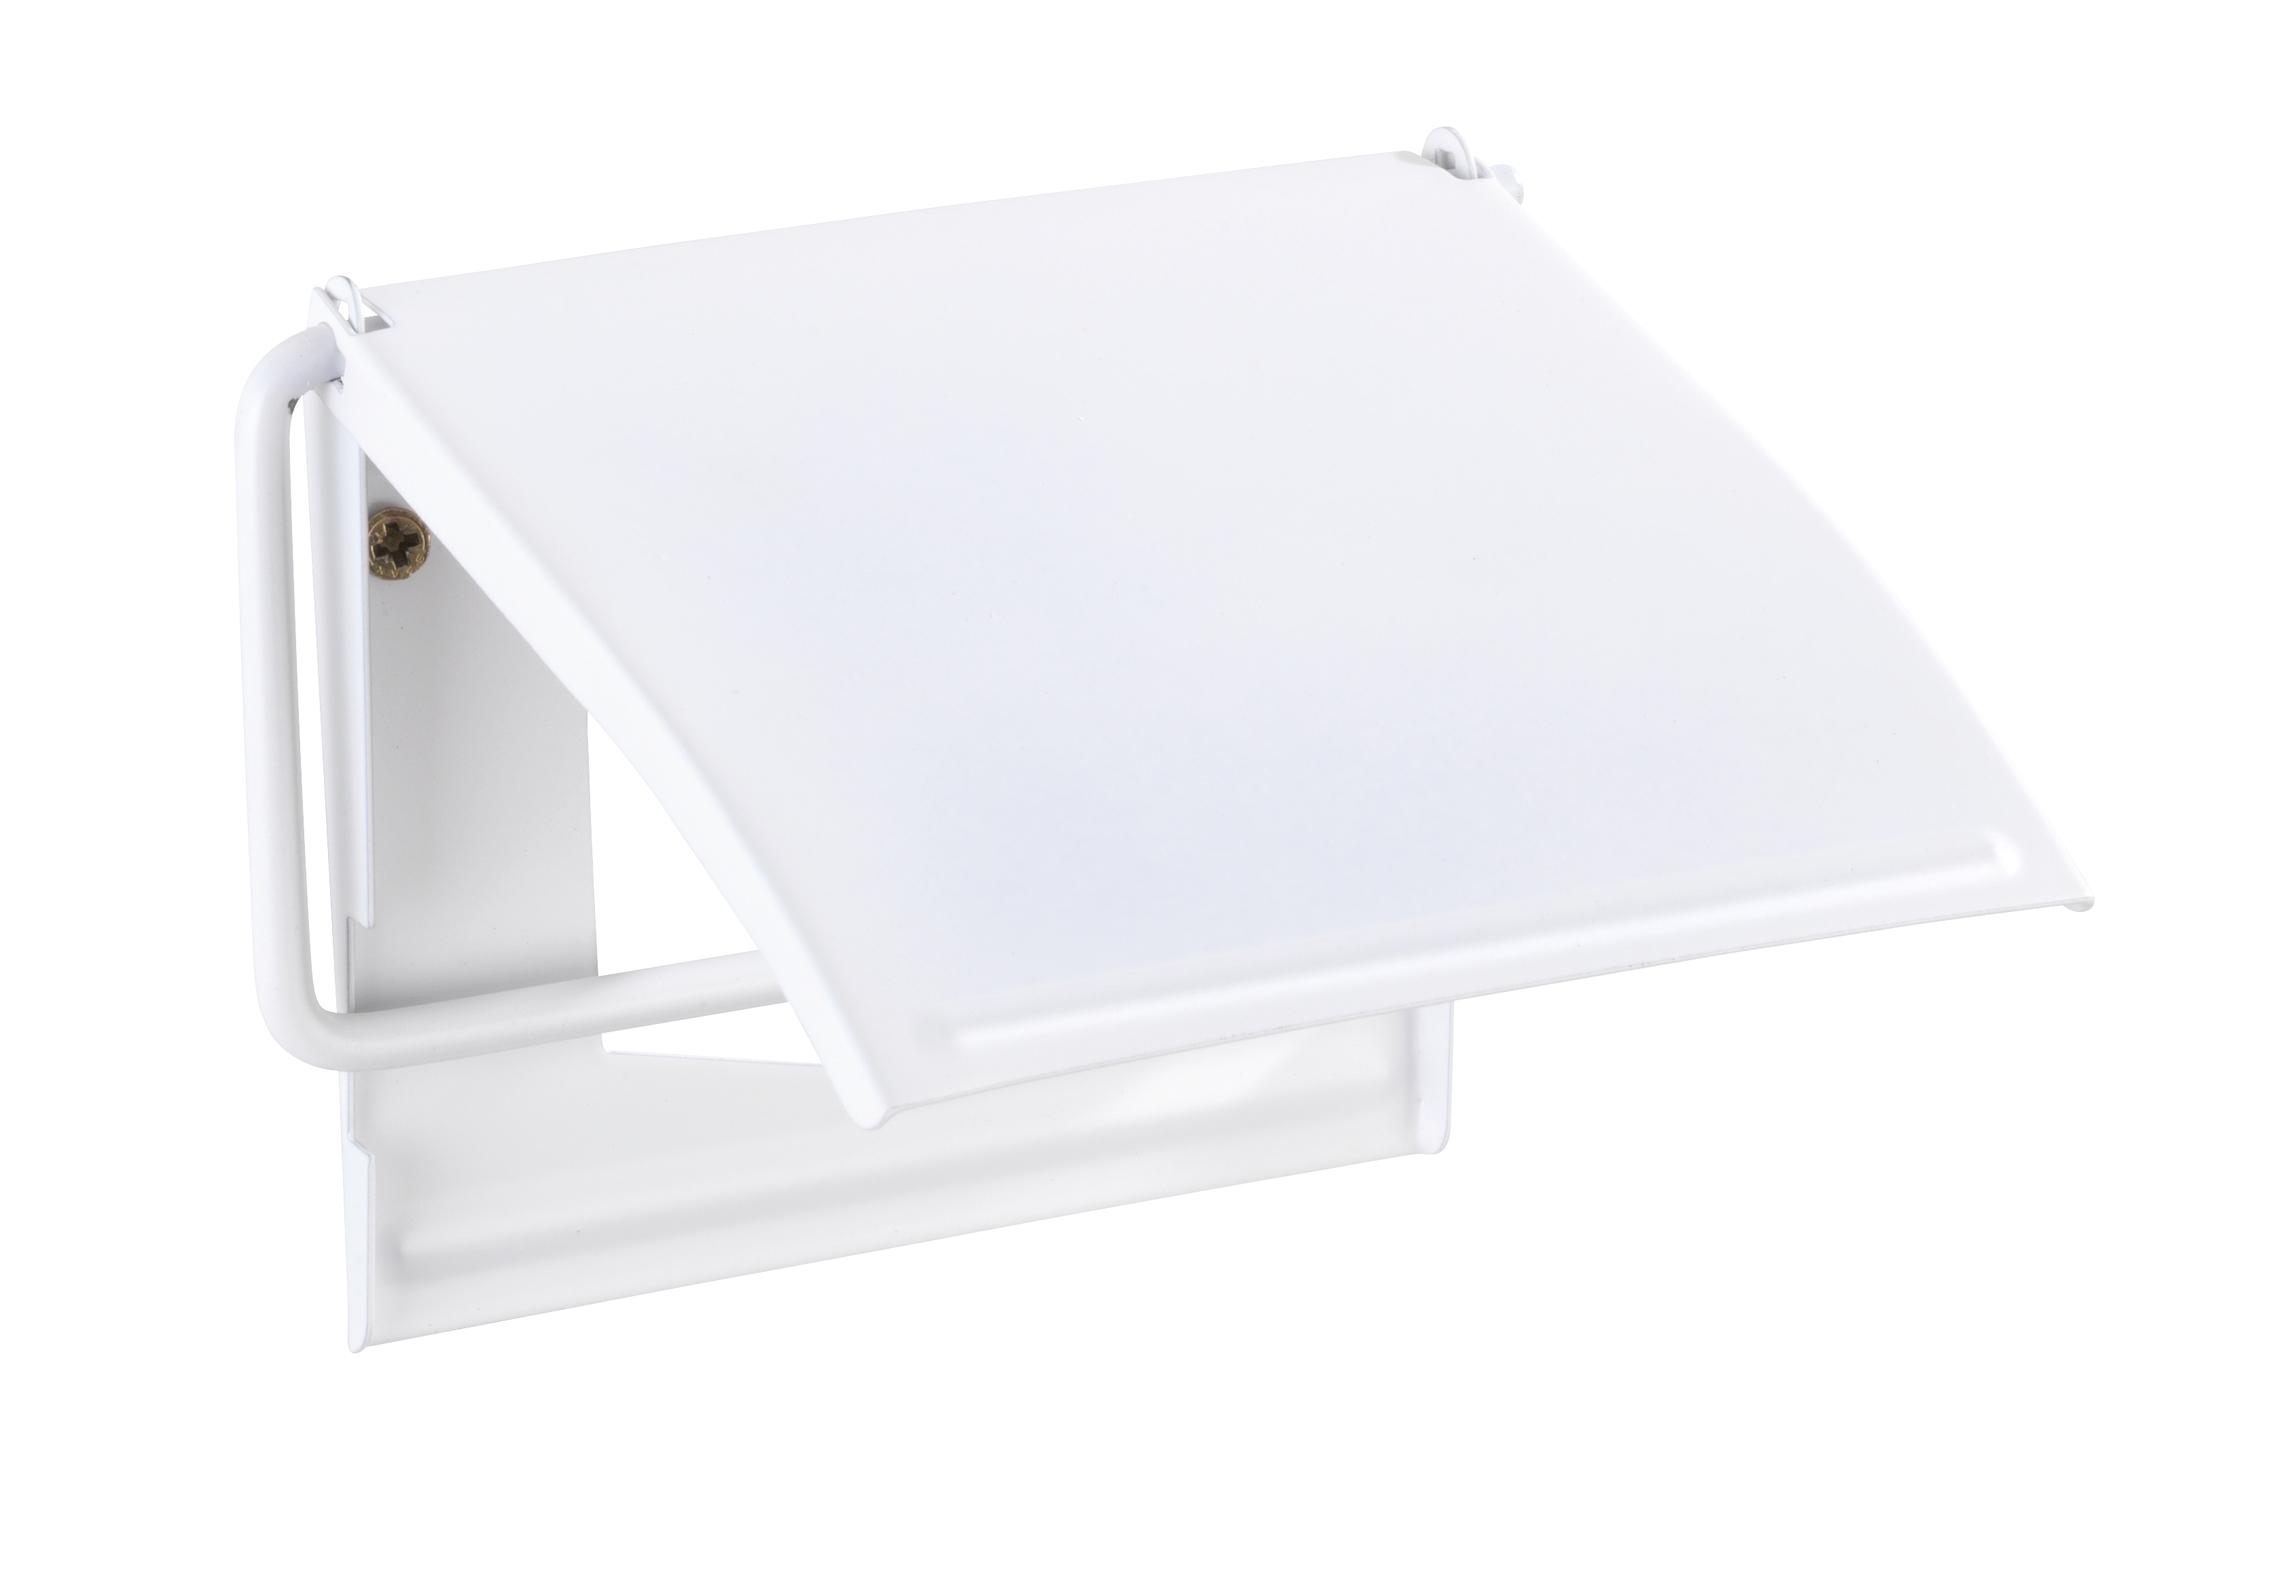 Suport pentru hartie igienica, Cover Alb, l13,5xA2,5xH12 cm